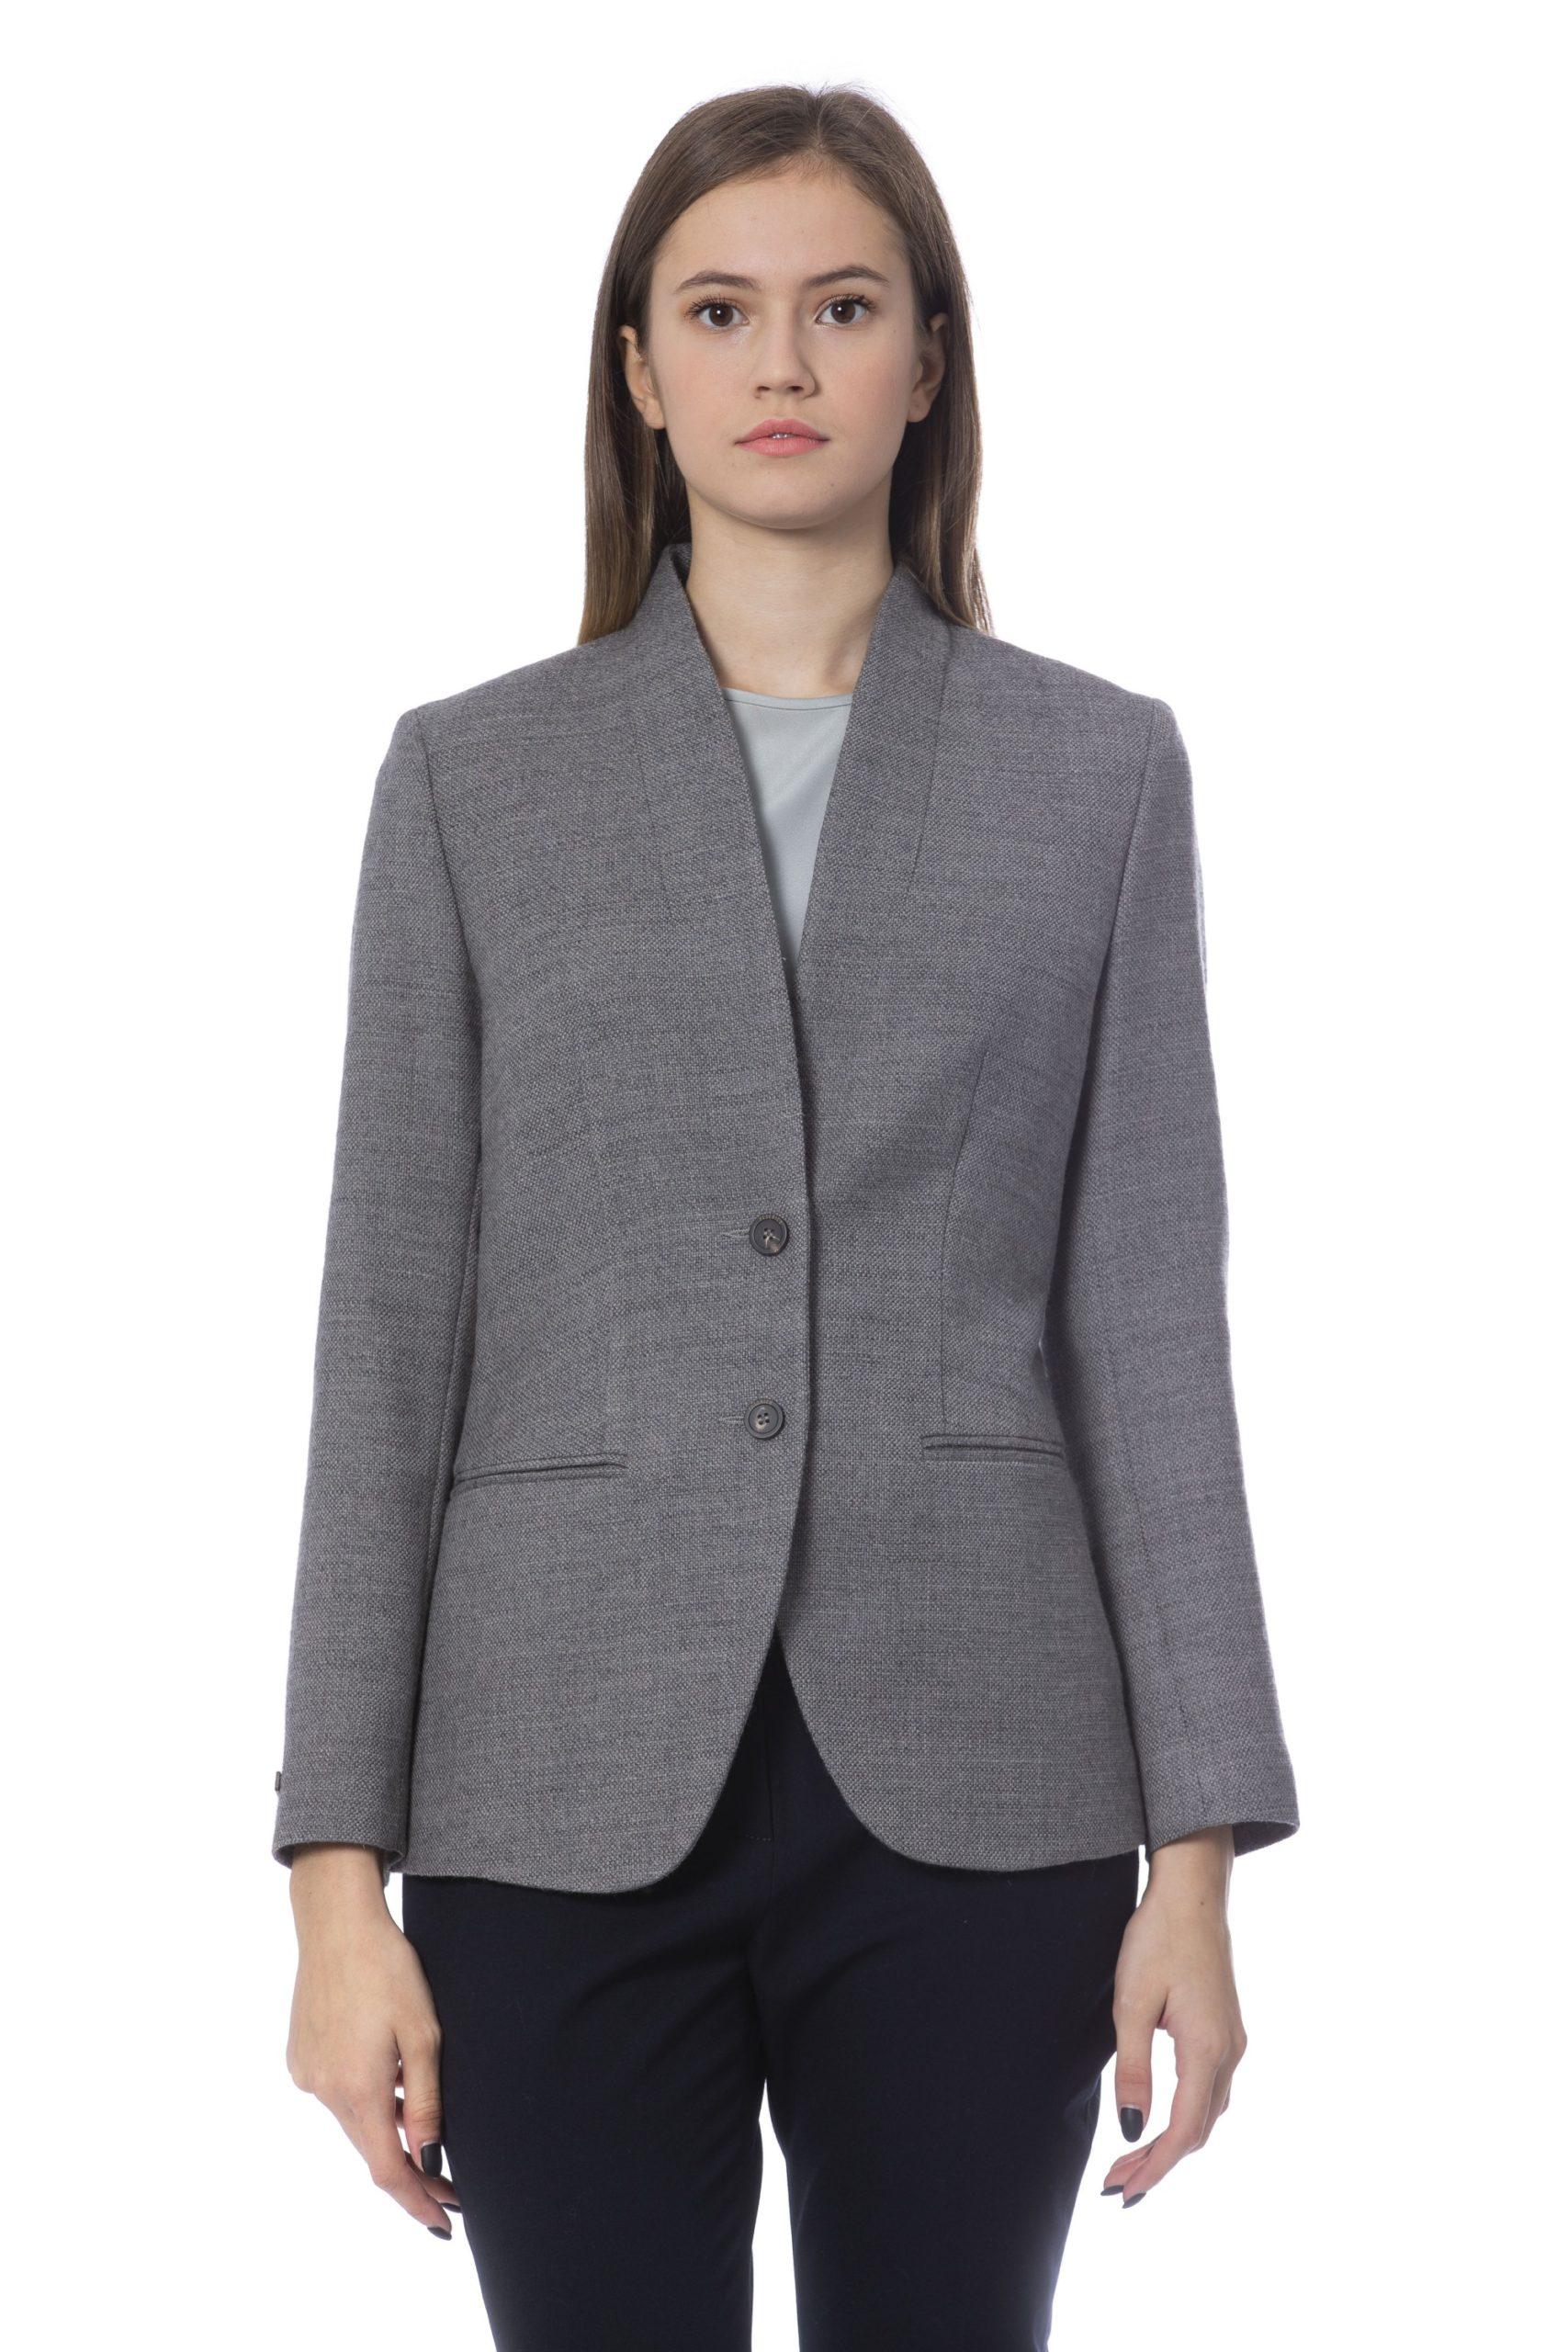 Peserico Women's Jacket Grey PE854542 - IT46 | L